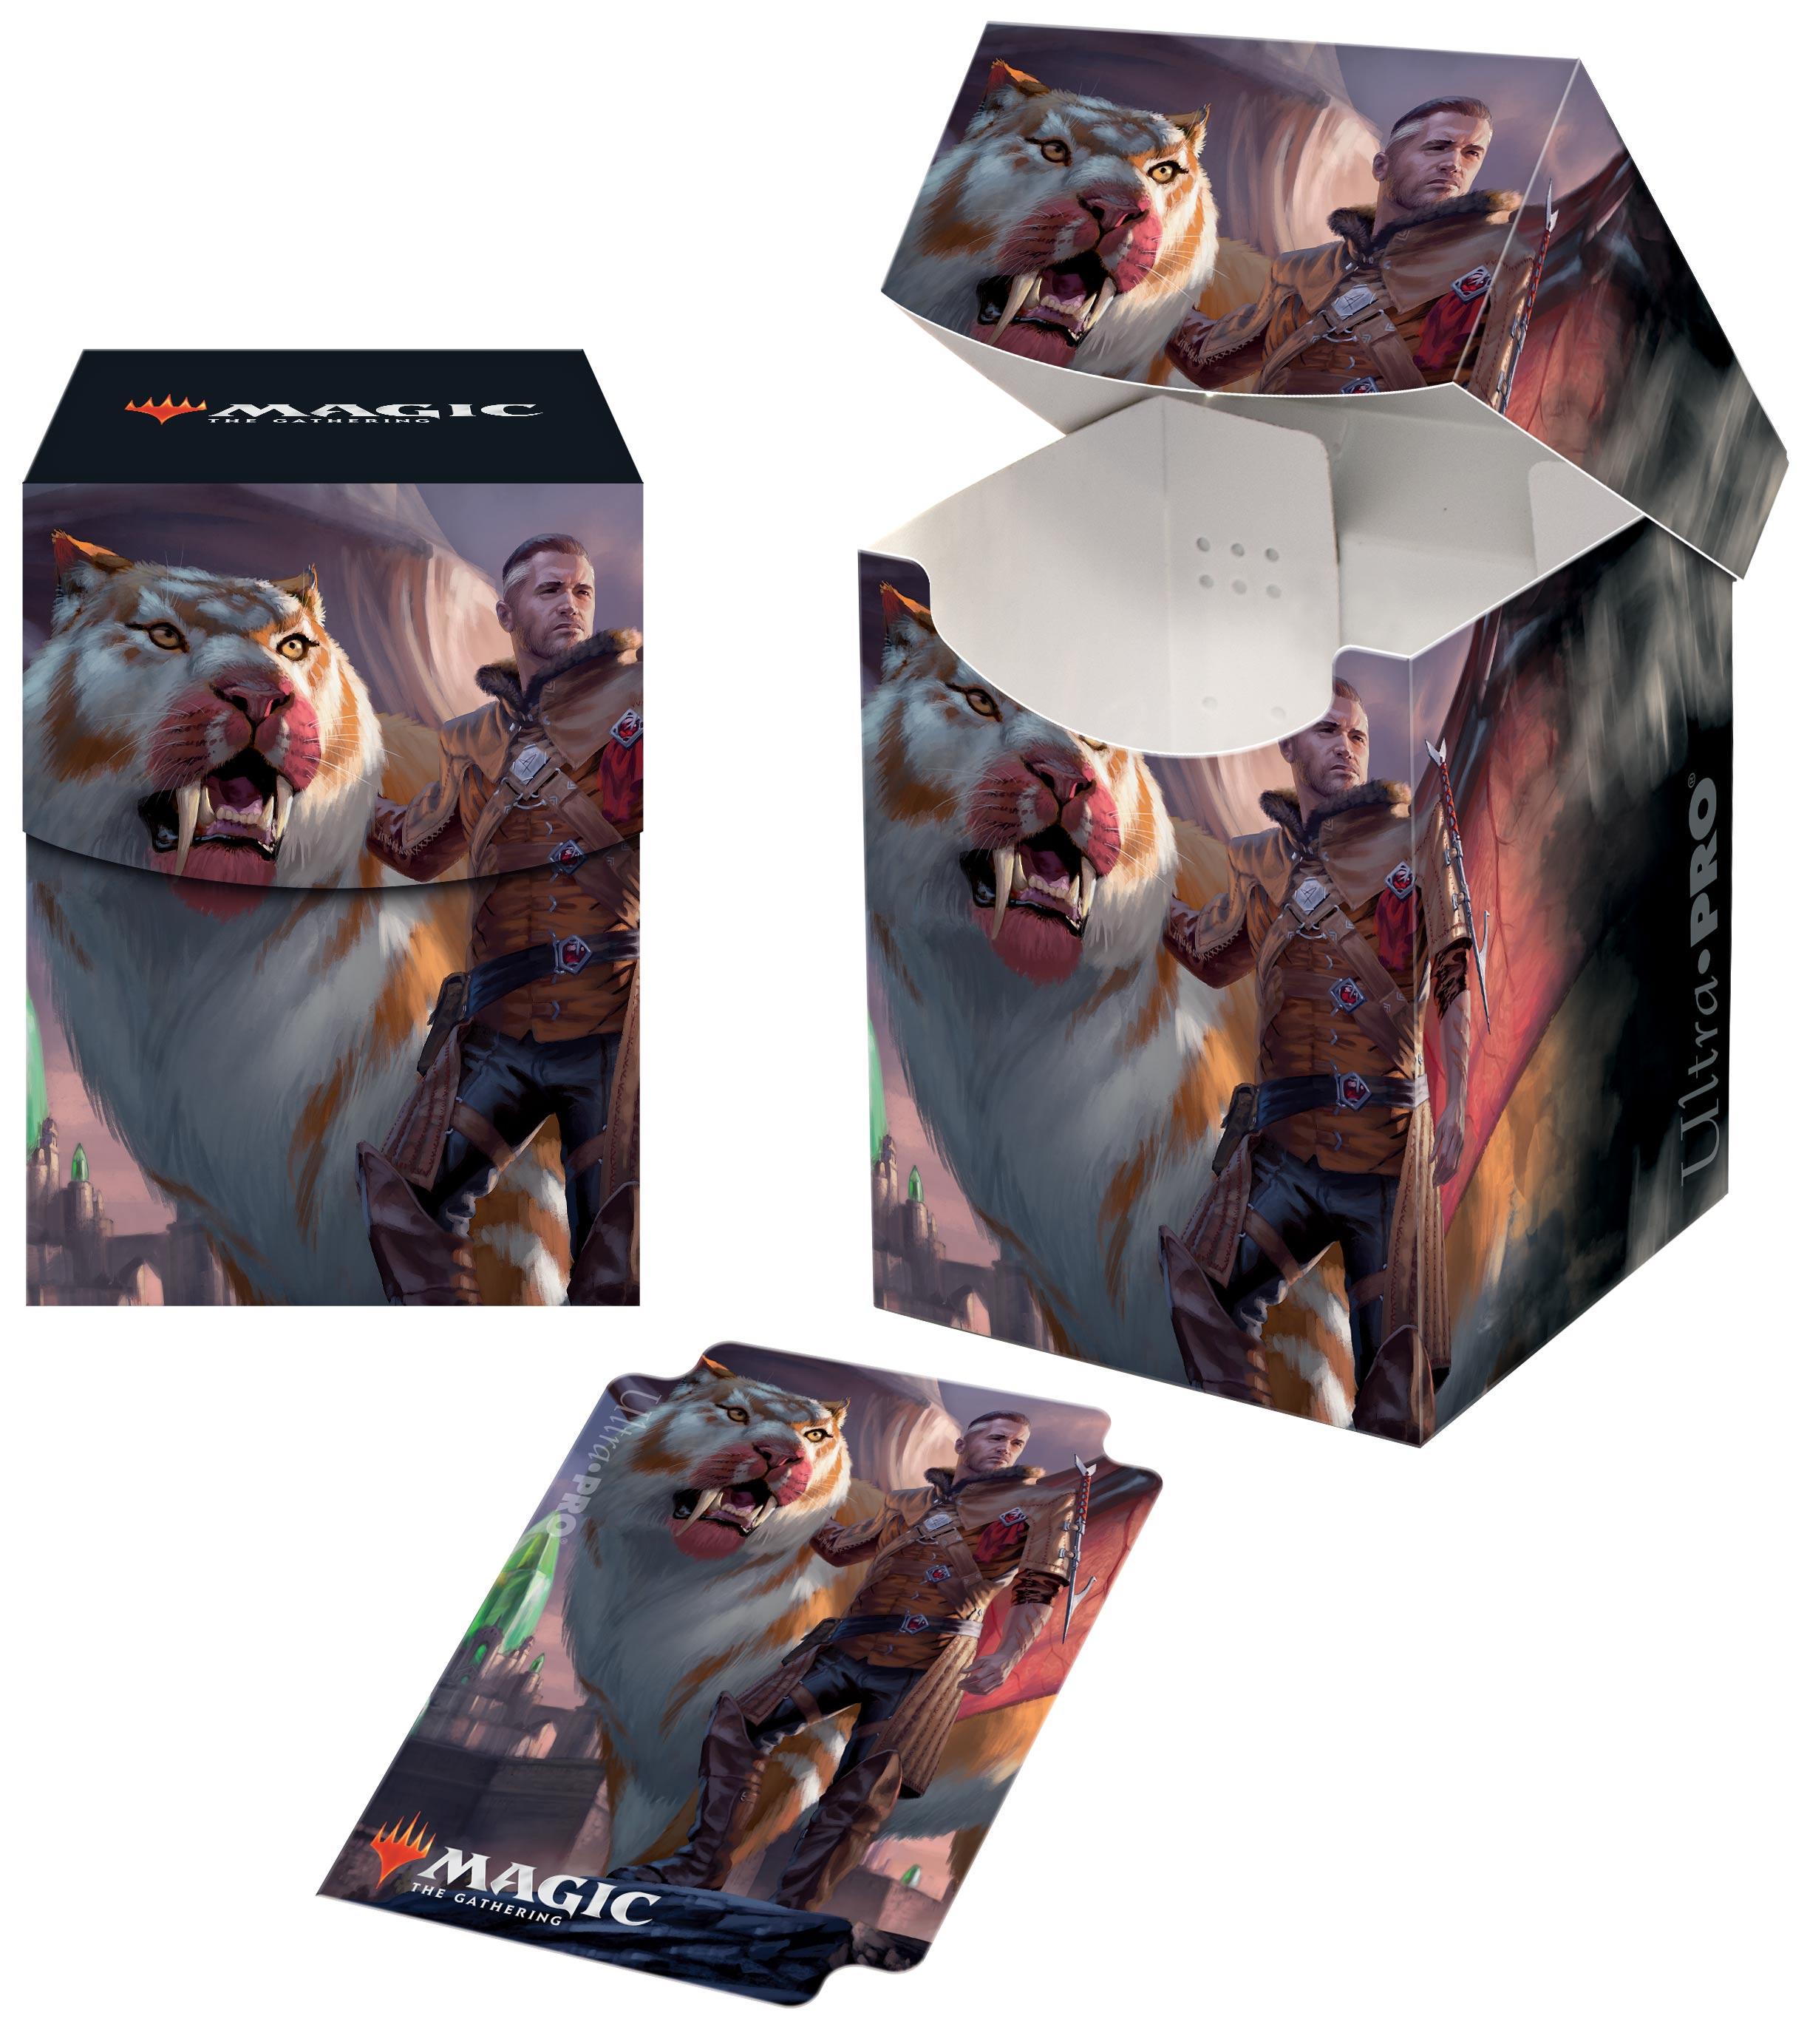 Ultra Pro - Ikoria: Lair of Behemoths PRO 100+ Deck Box - Lukka, Coppercoat Outcast